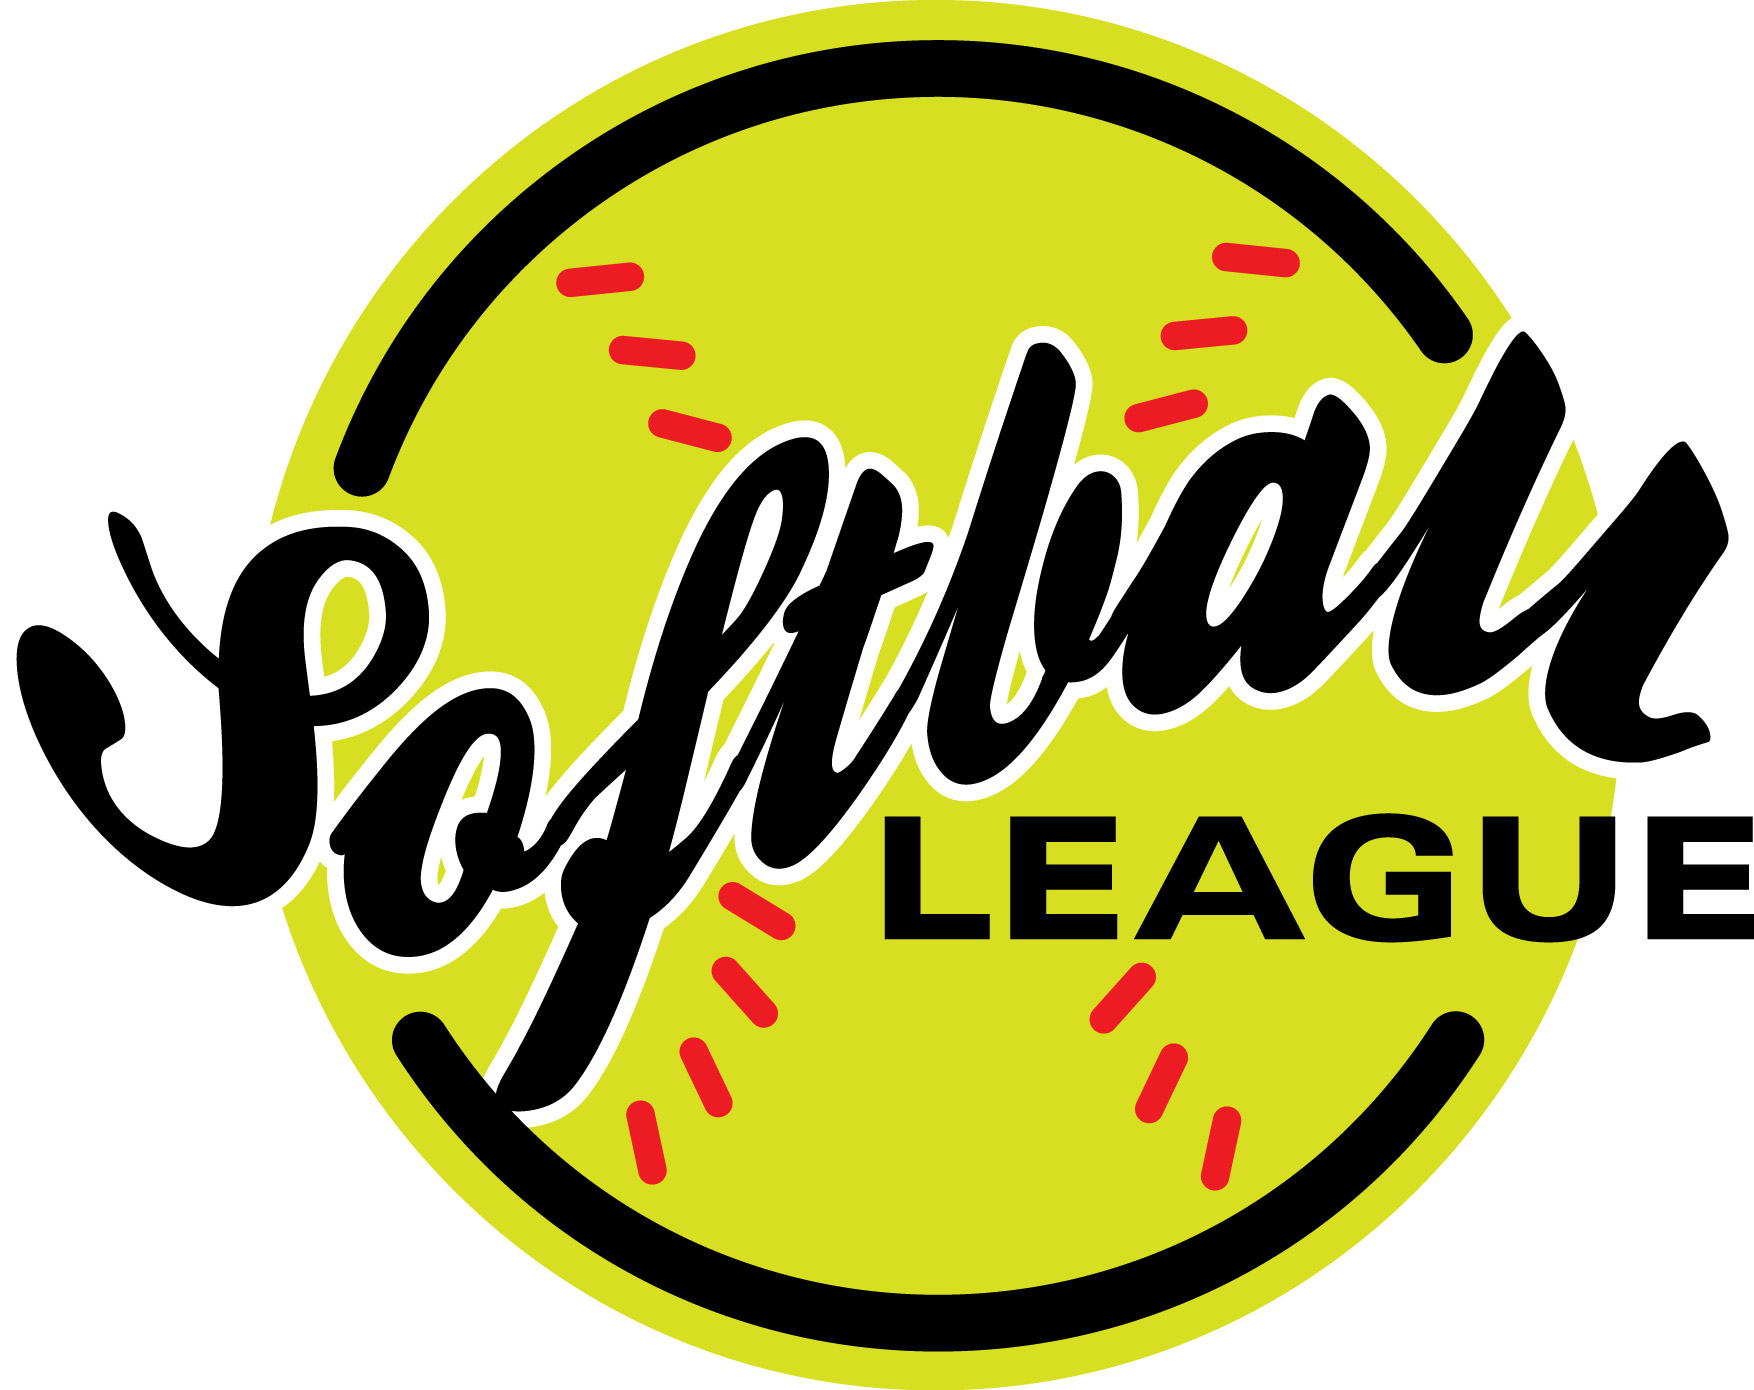 Free download clip art. Softball clipart softball league